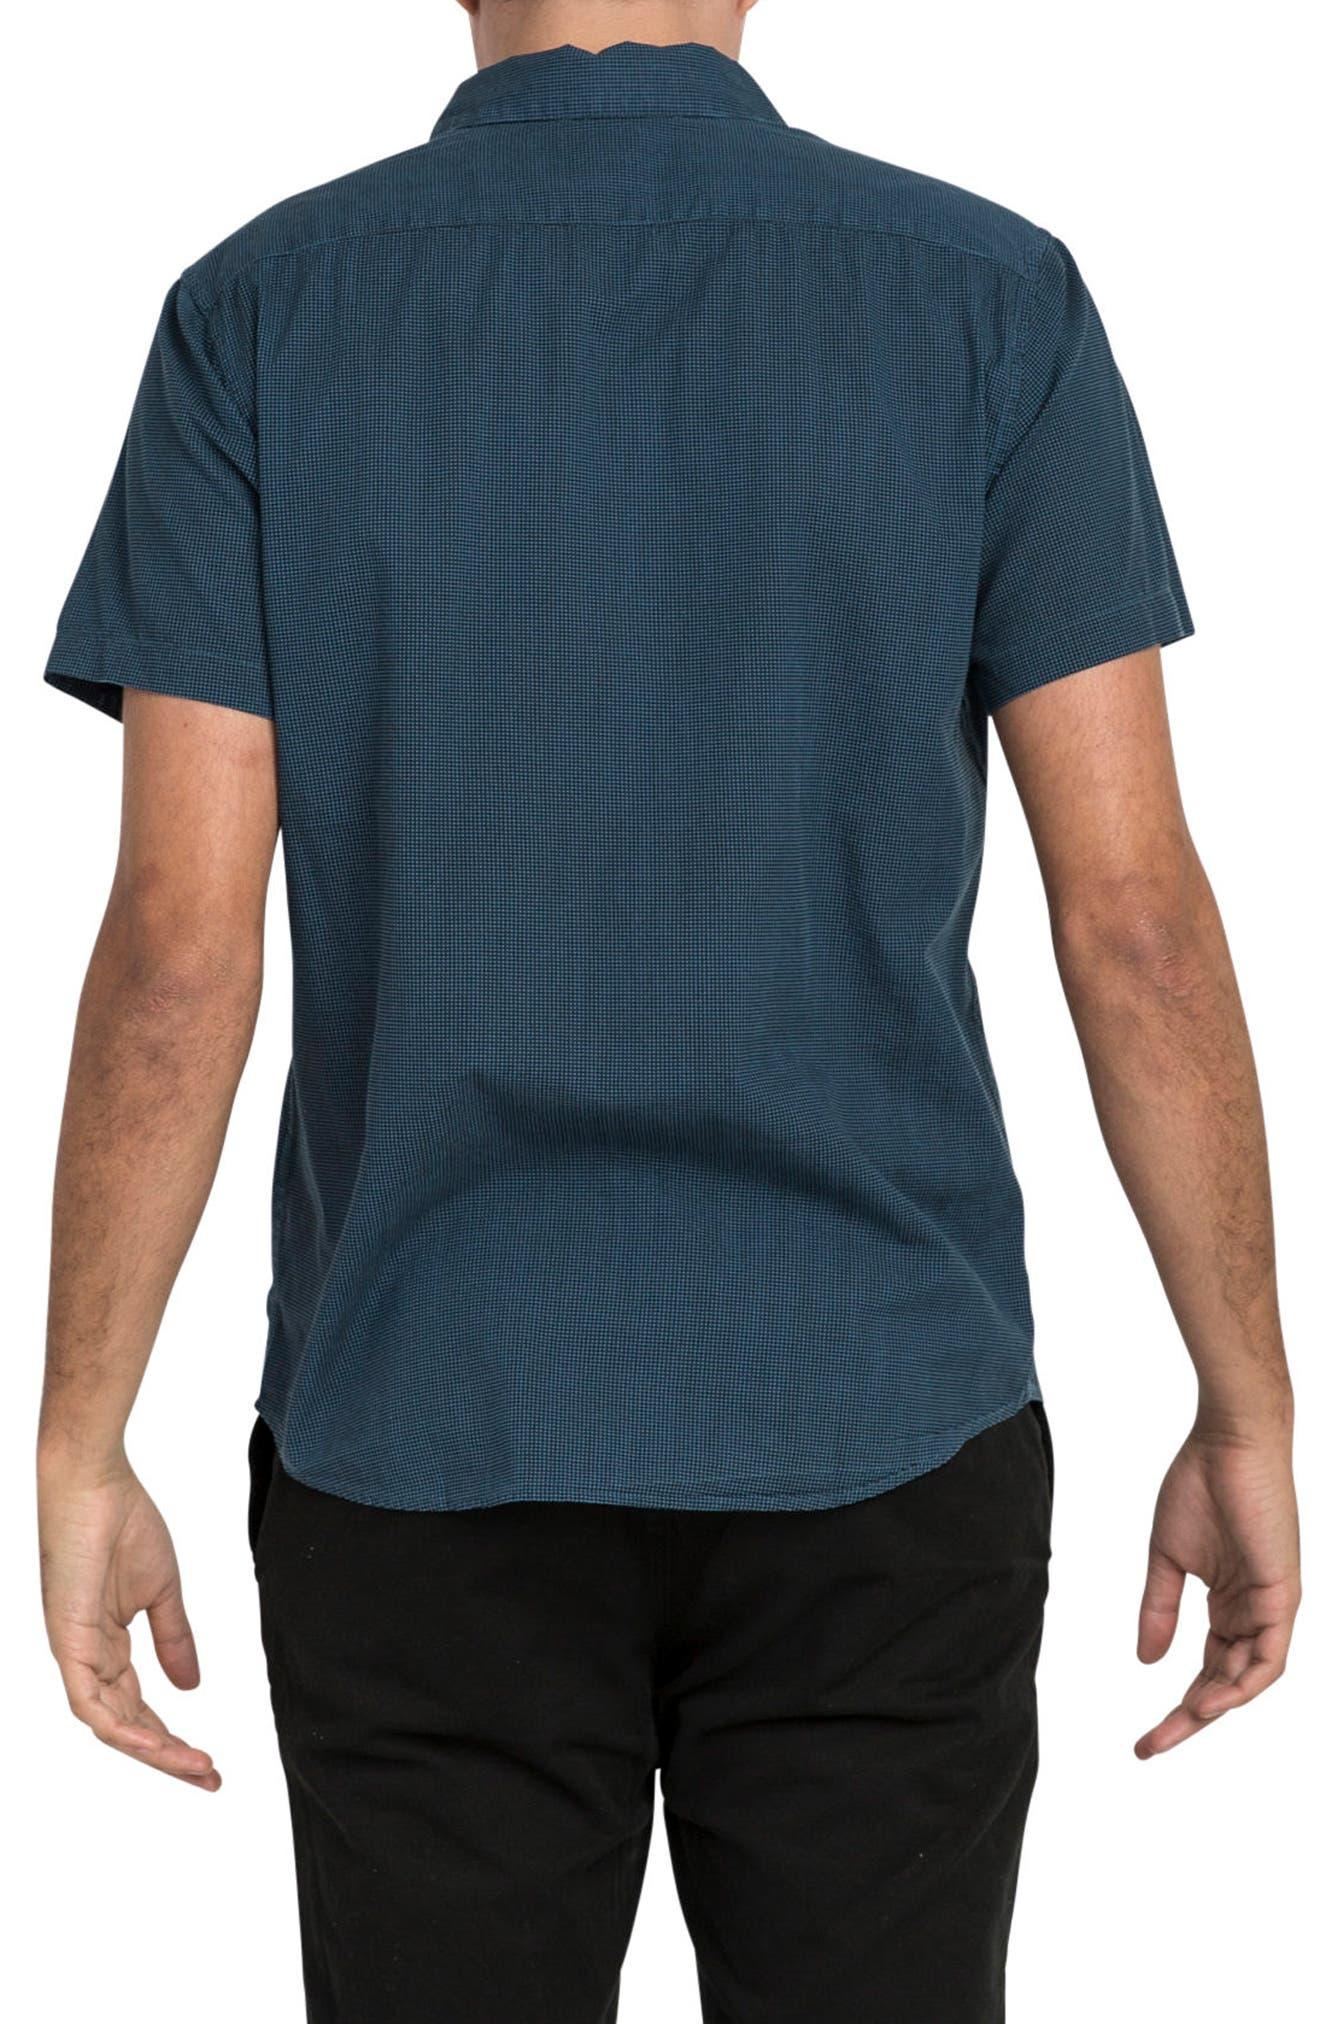 No Name Woven Shirt,                             Alternate thumbnail 2, color,                             Dark Denim